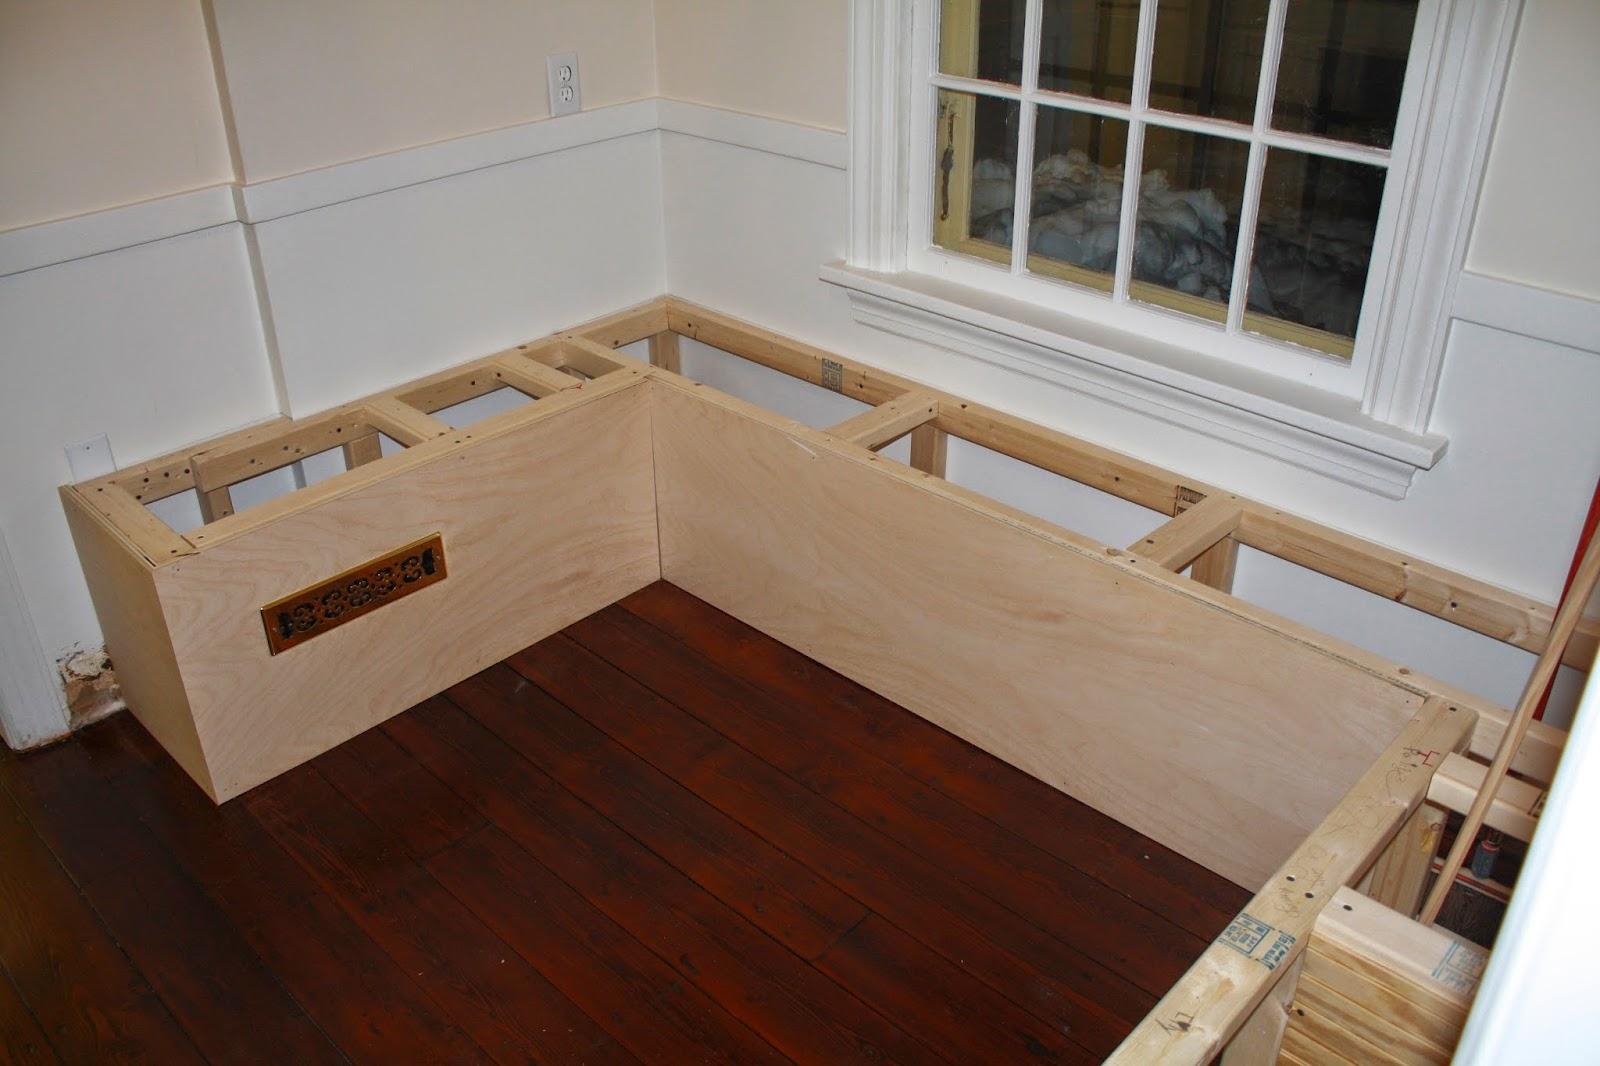 Restoring The Splendor Old House Restorations Old Home Renovations Home Improvements